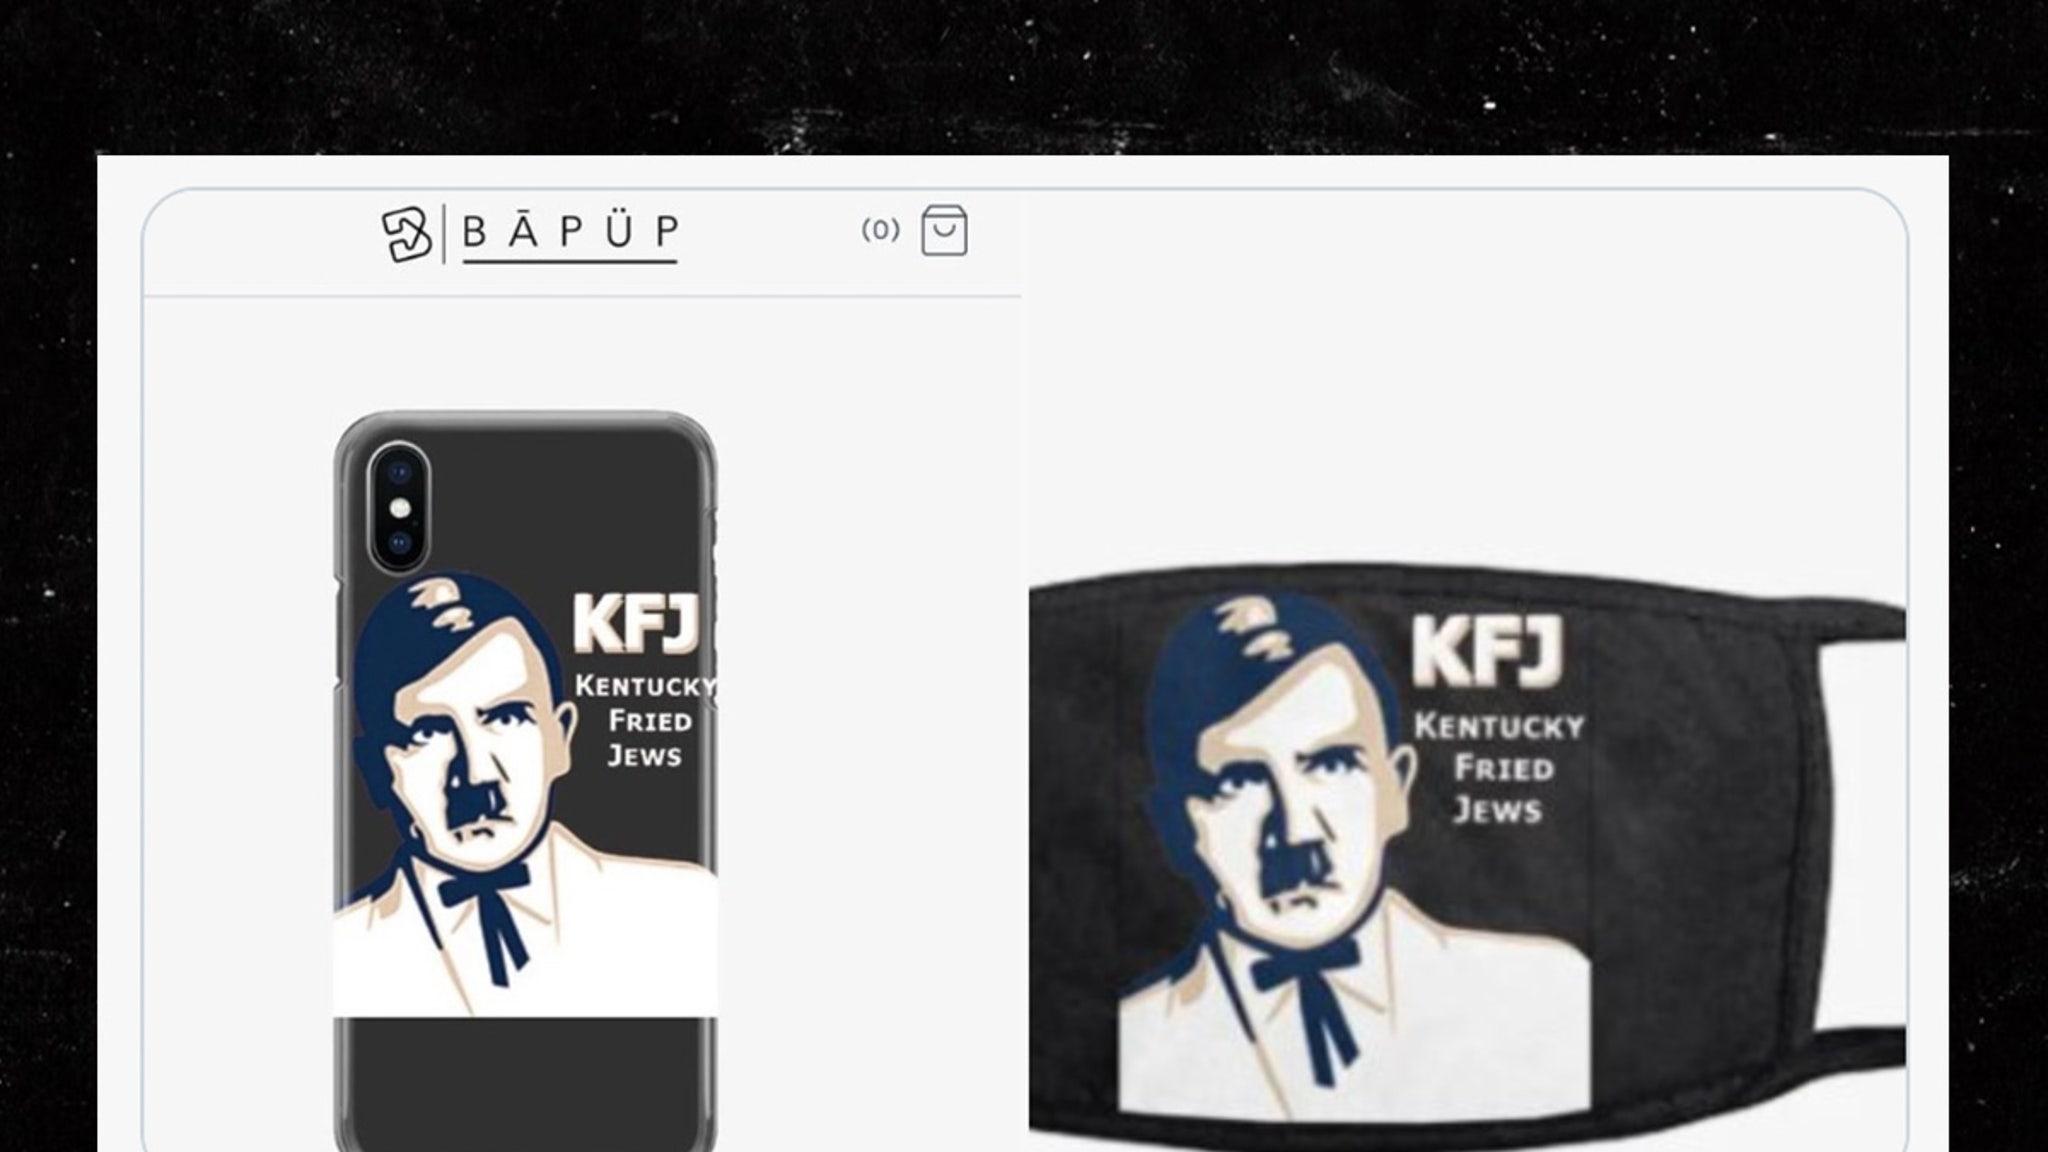 Hitler 'Kentucky Fried Jews' Merch Pops Up Online, Site Taken Down